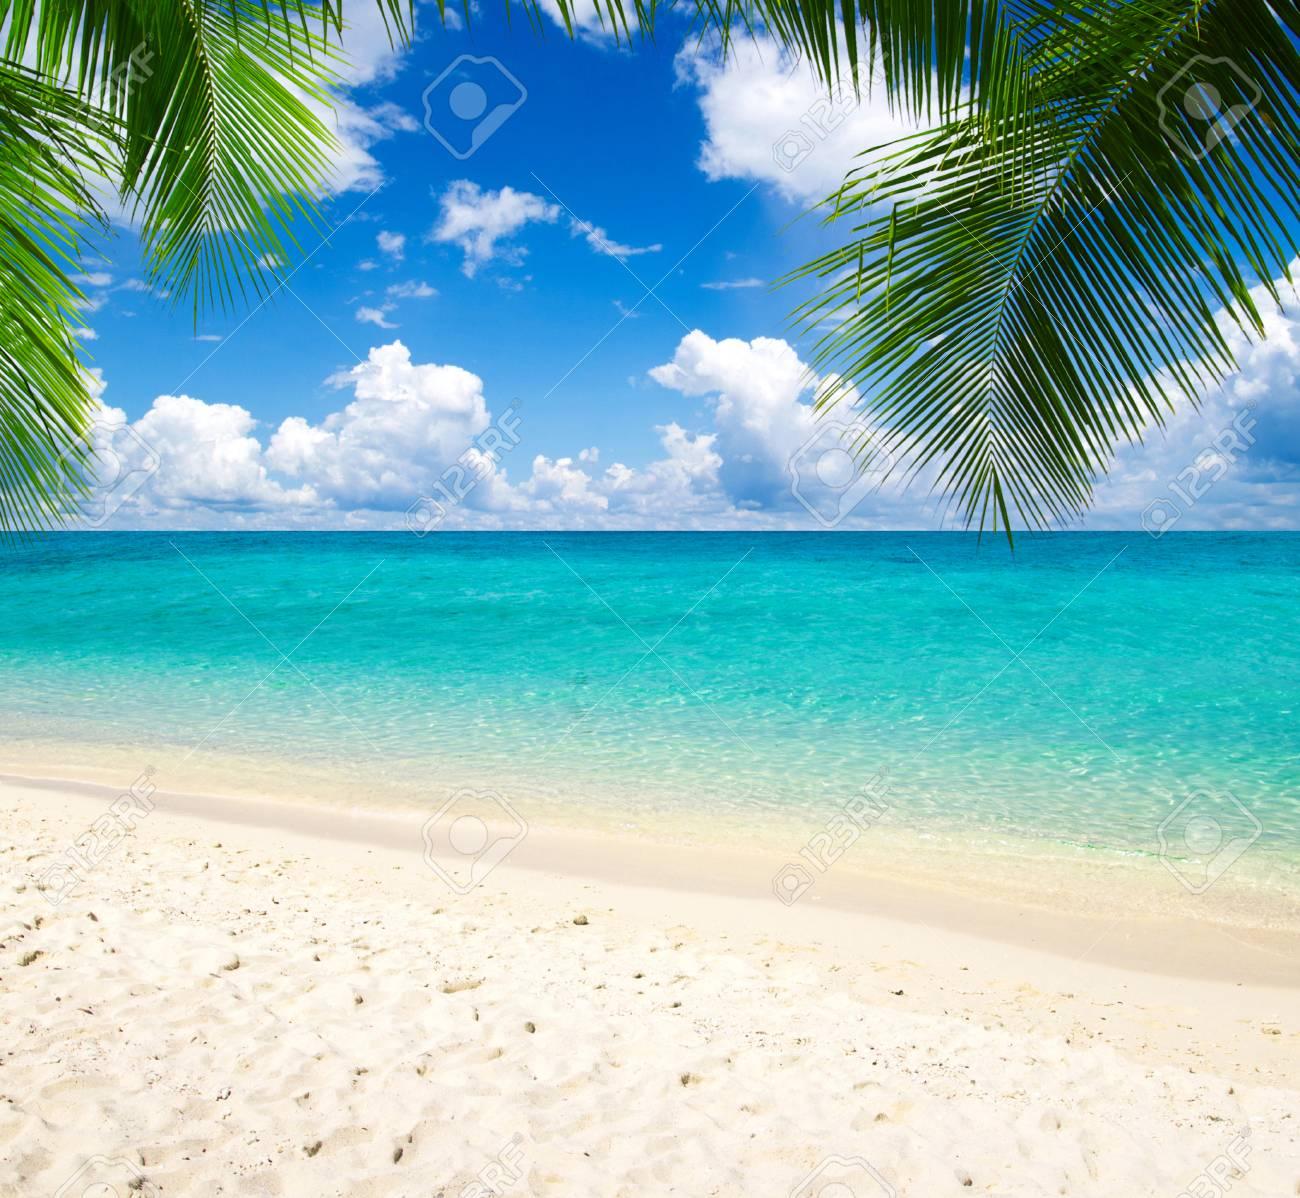 beautiful beach and tropical sea - 33811129